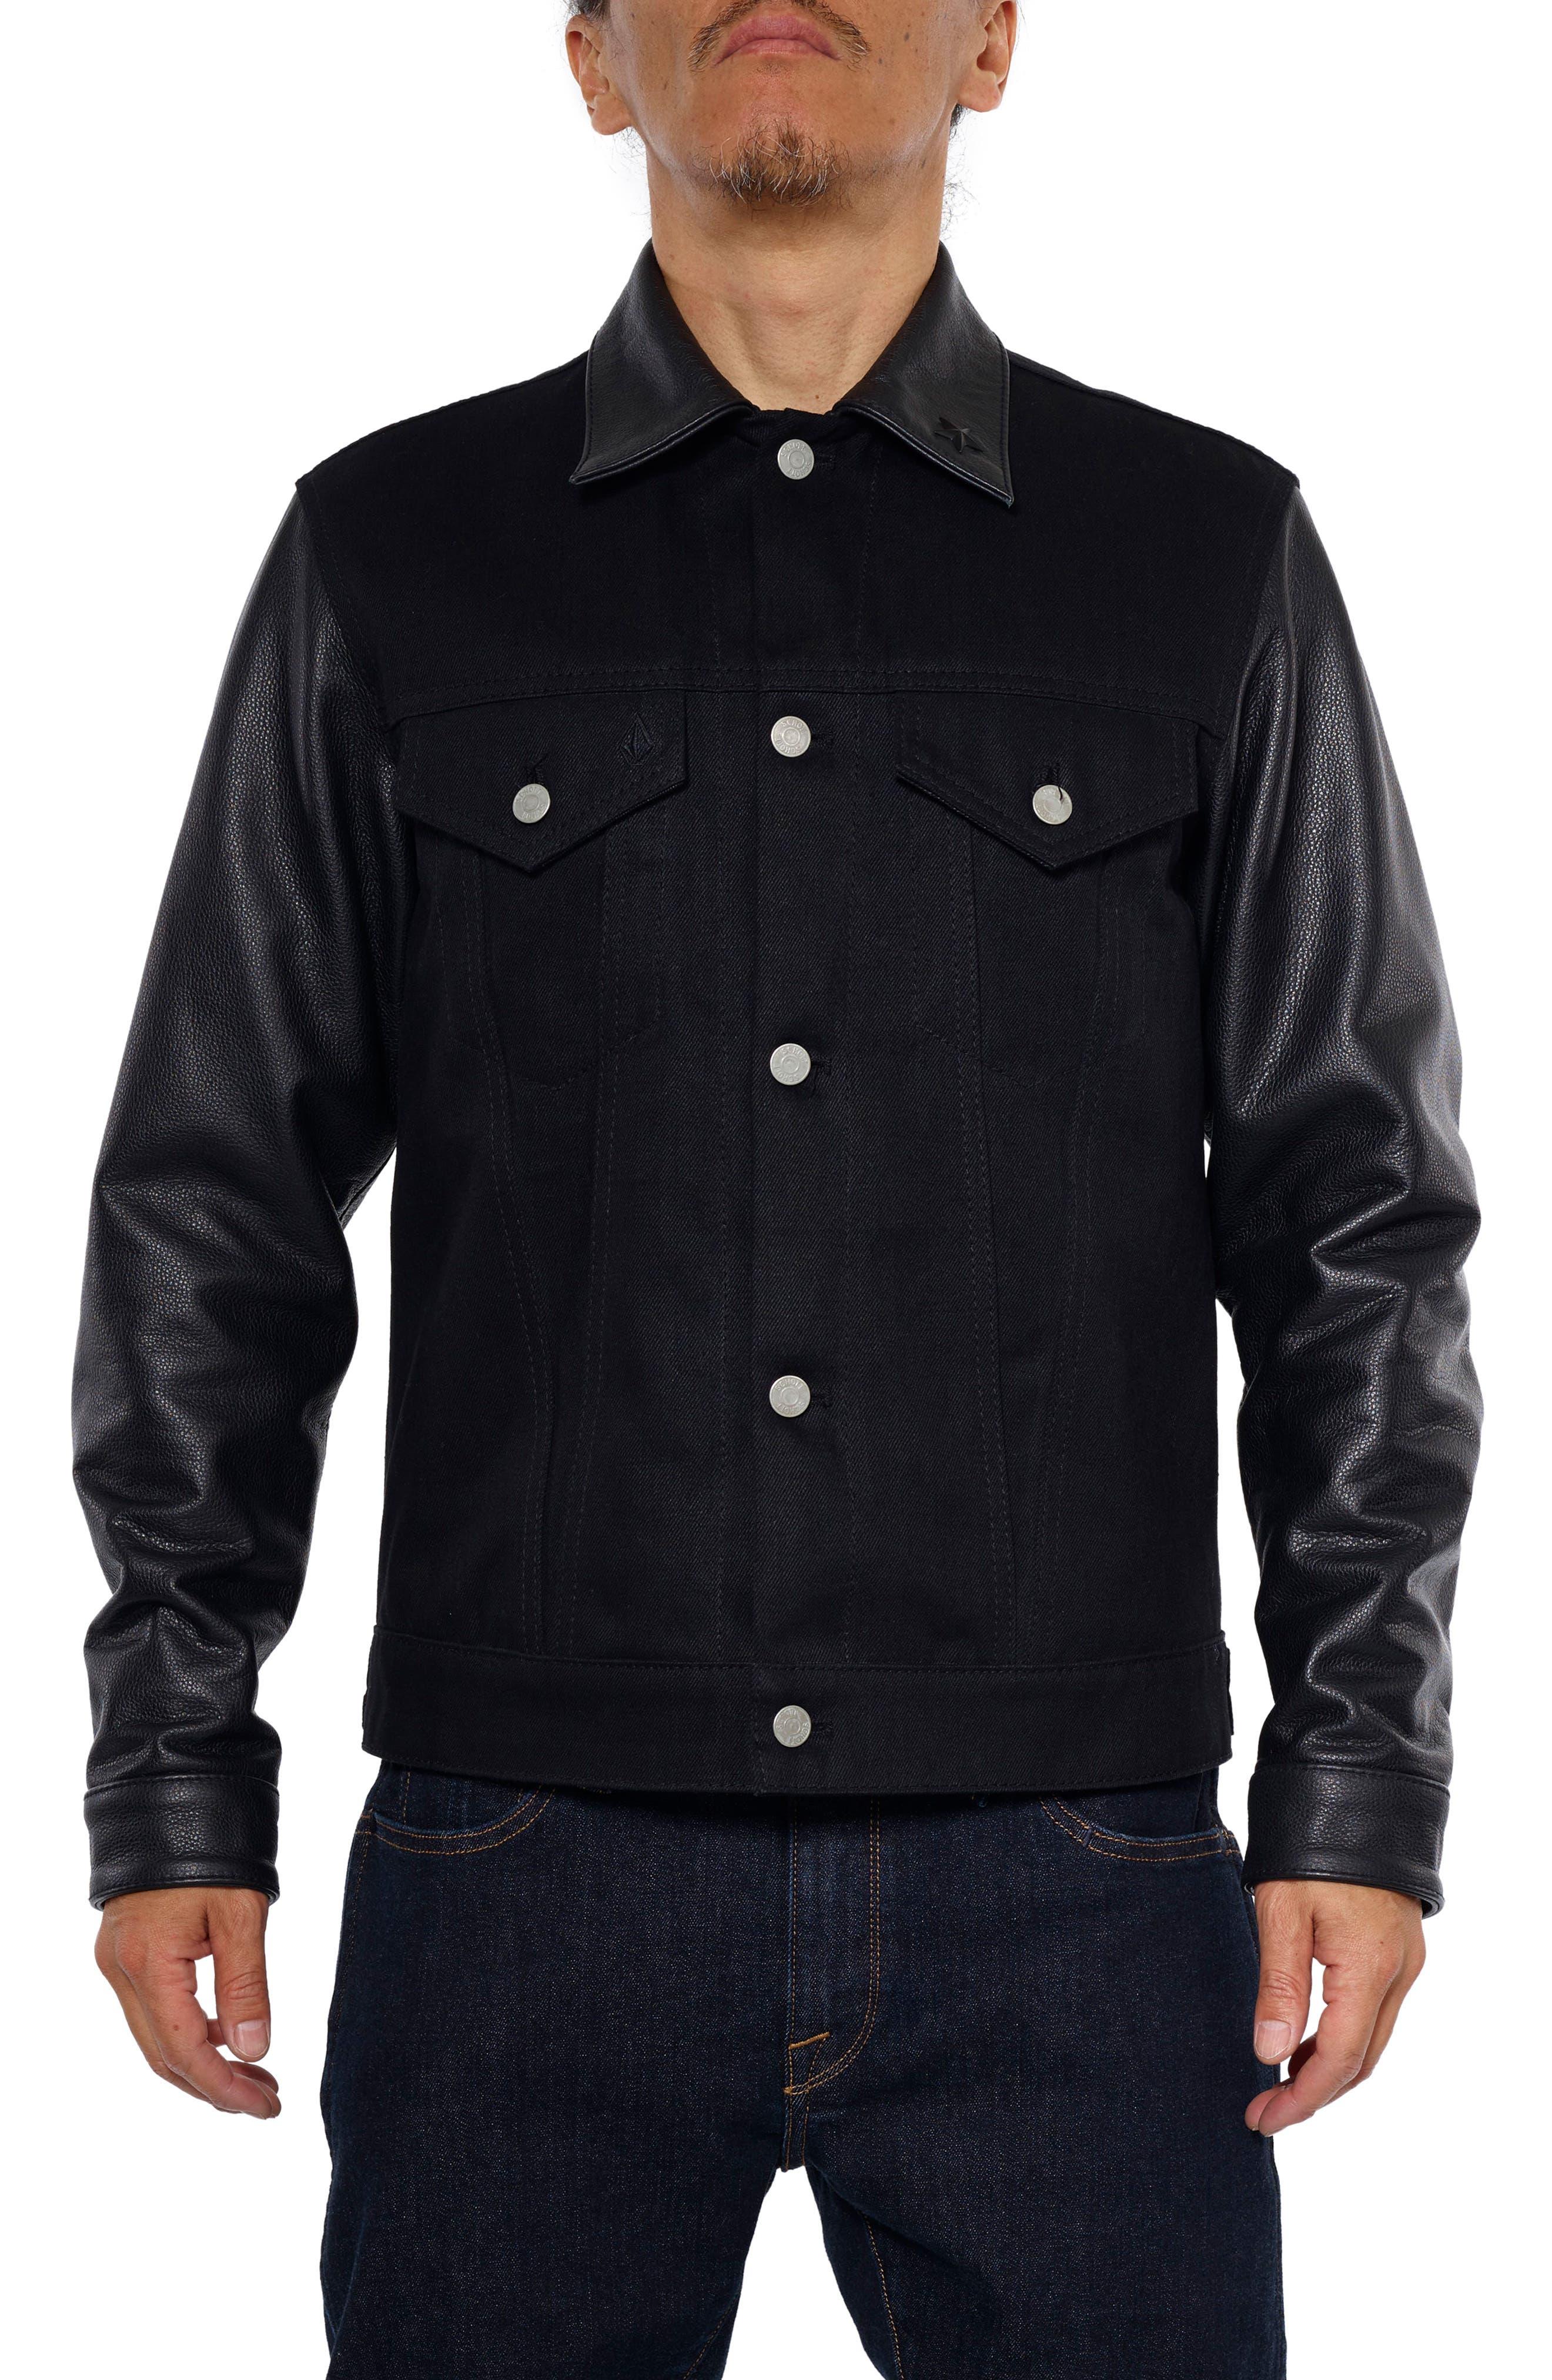 x Schott Denim Jacket,                             Main thumbnail 1, color,                             001